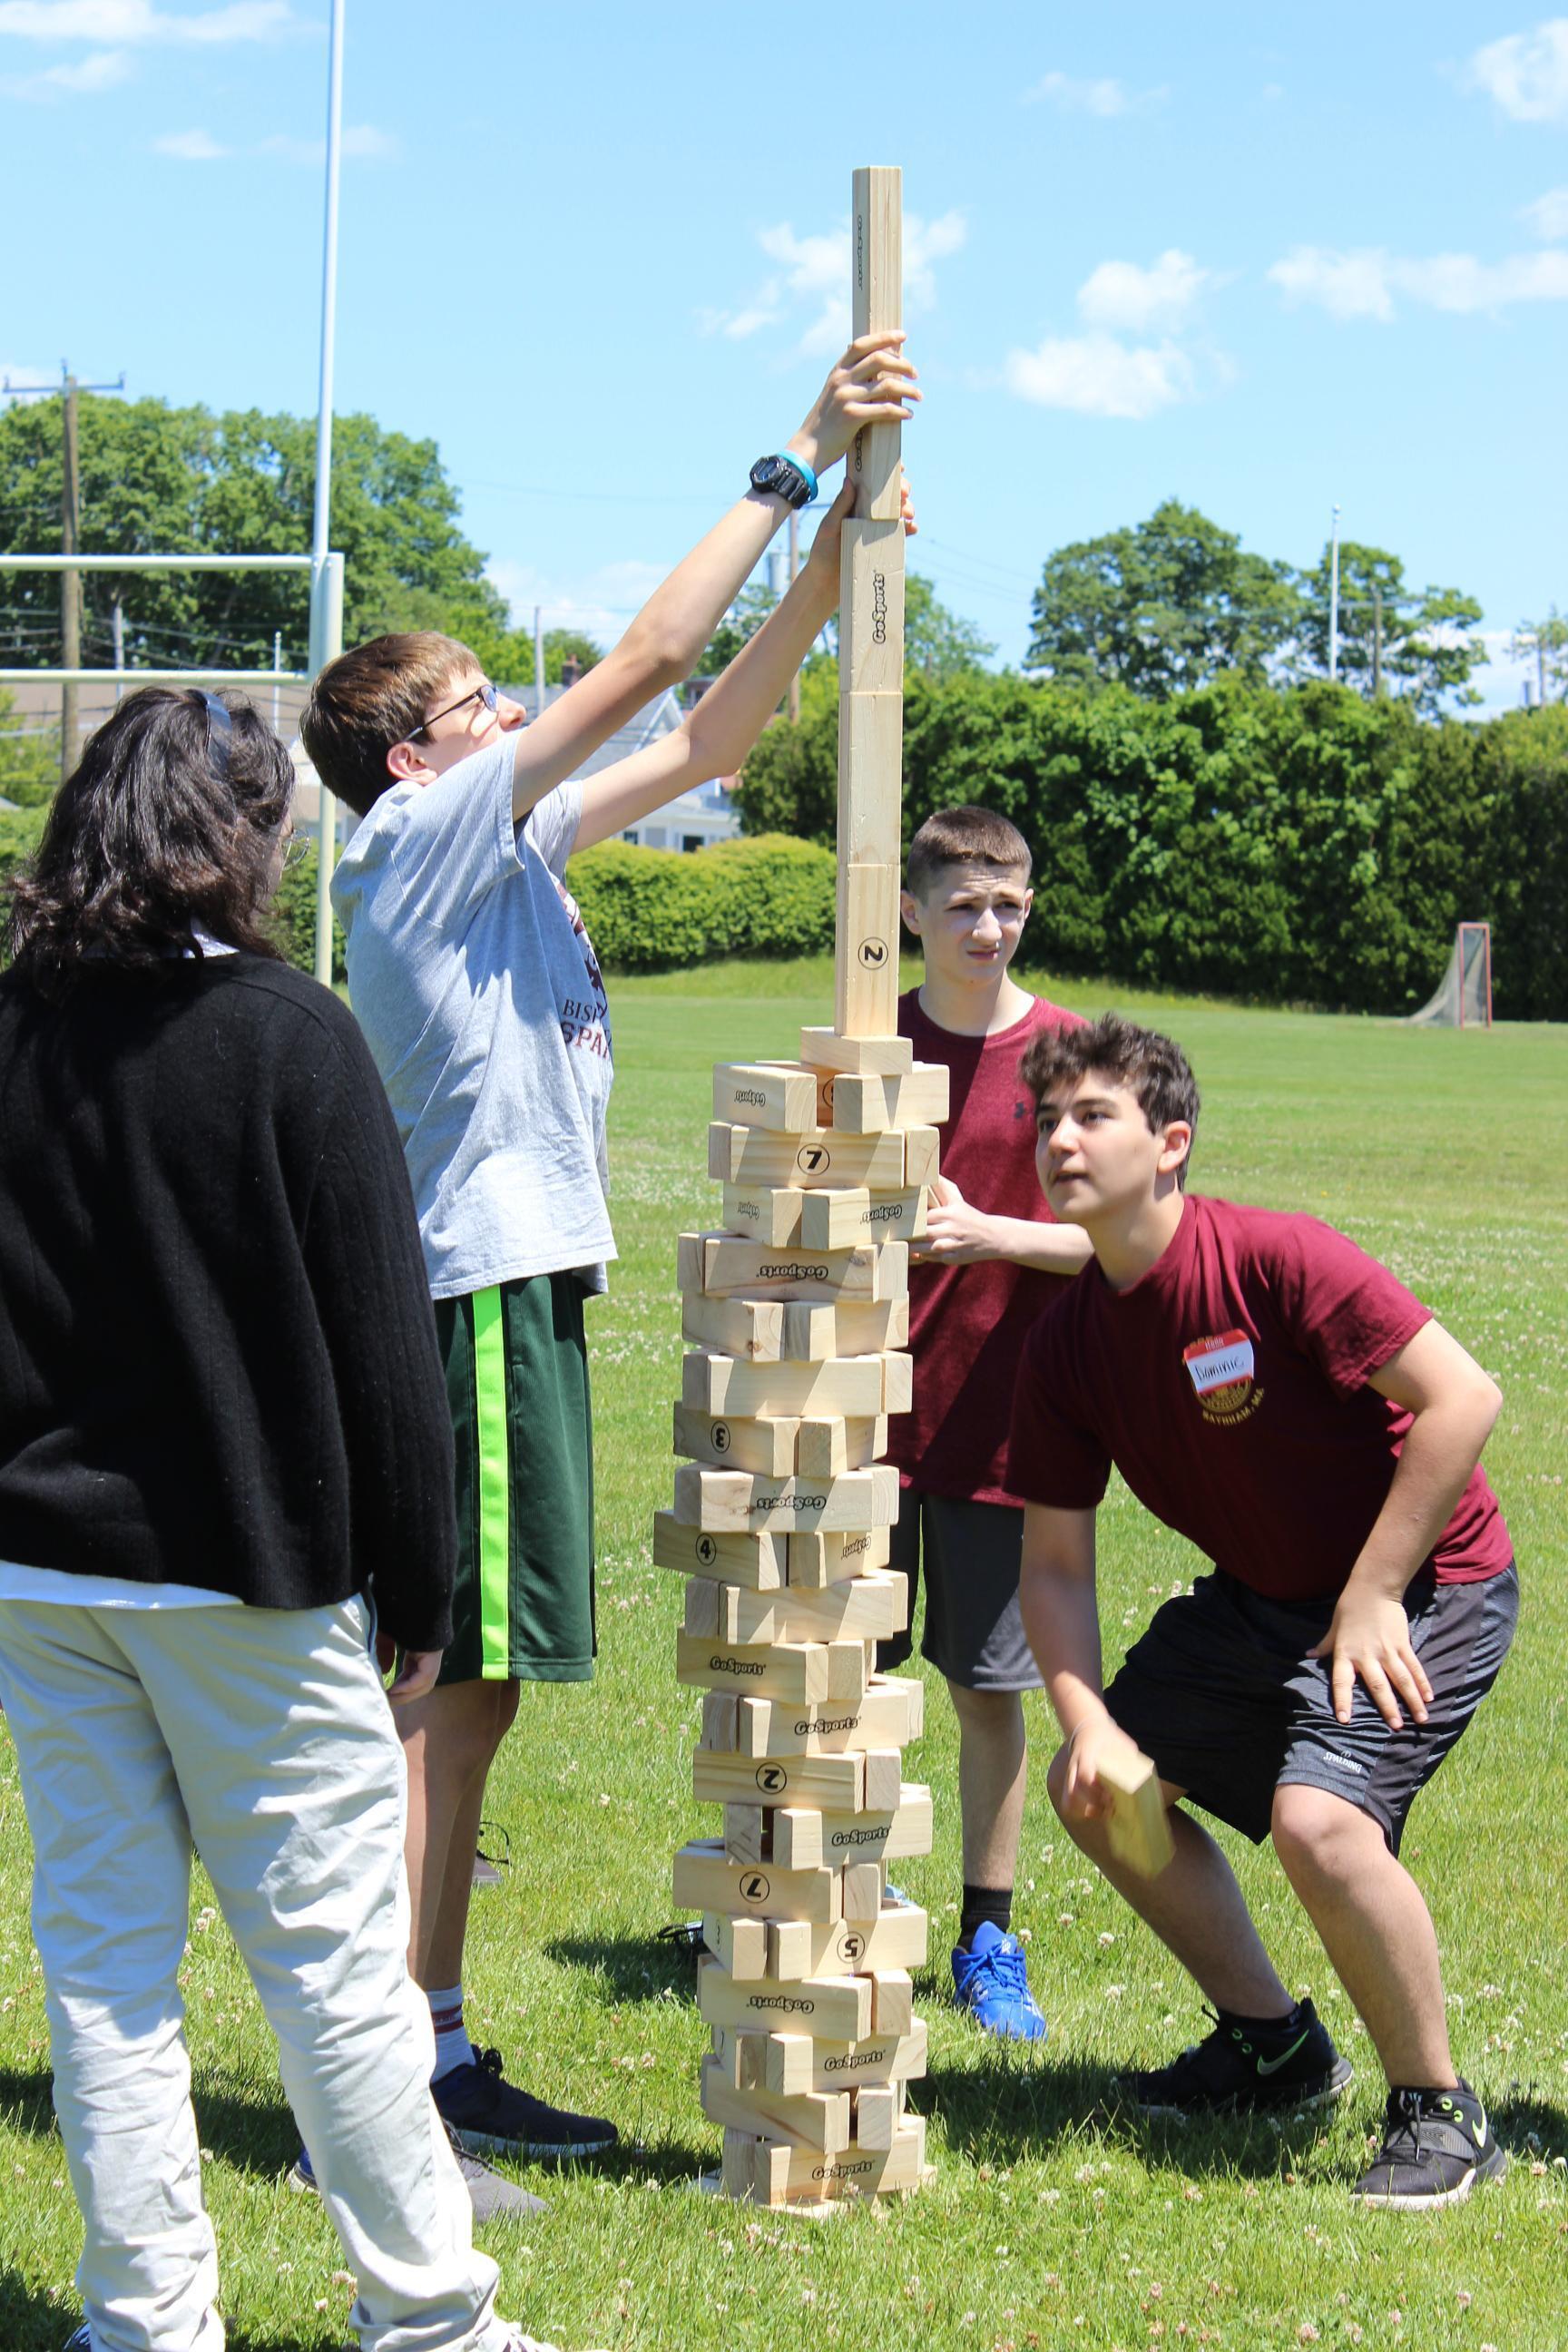 Students playing giant jenga game outside